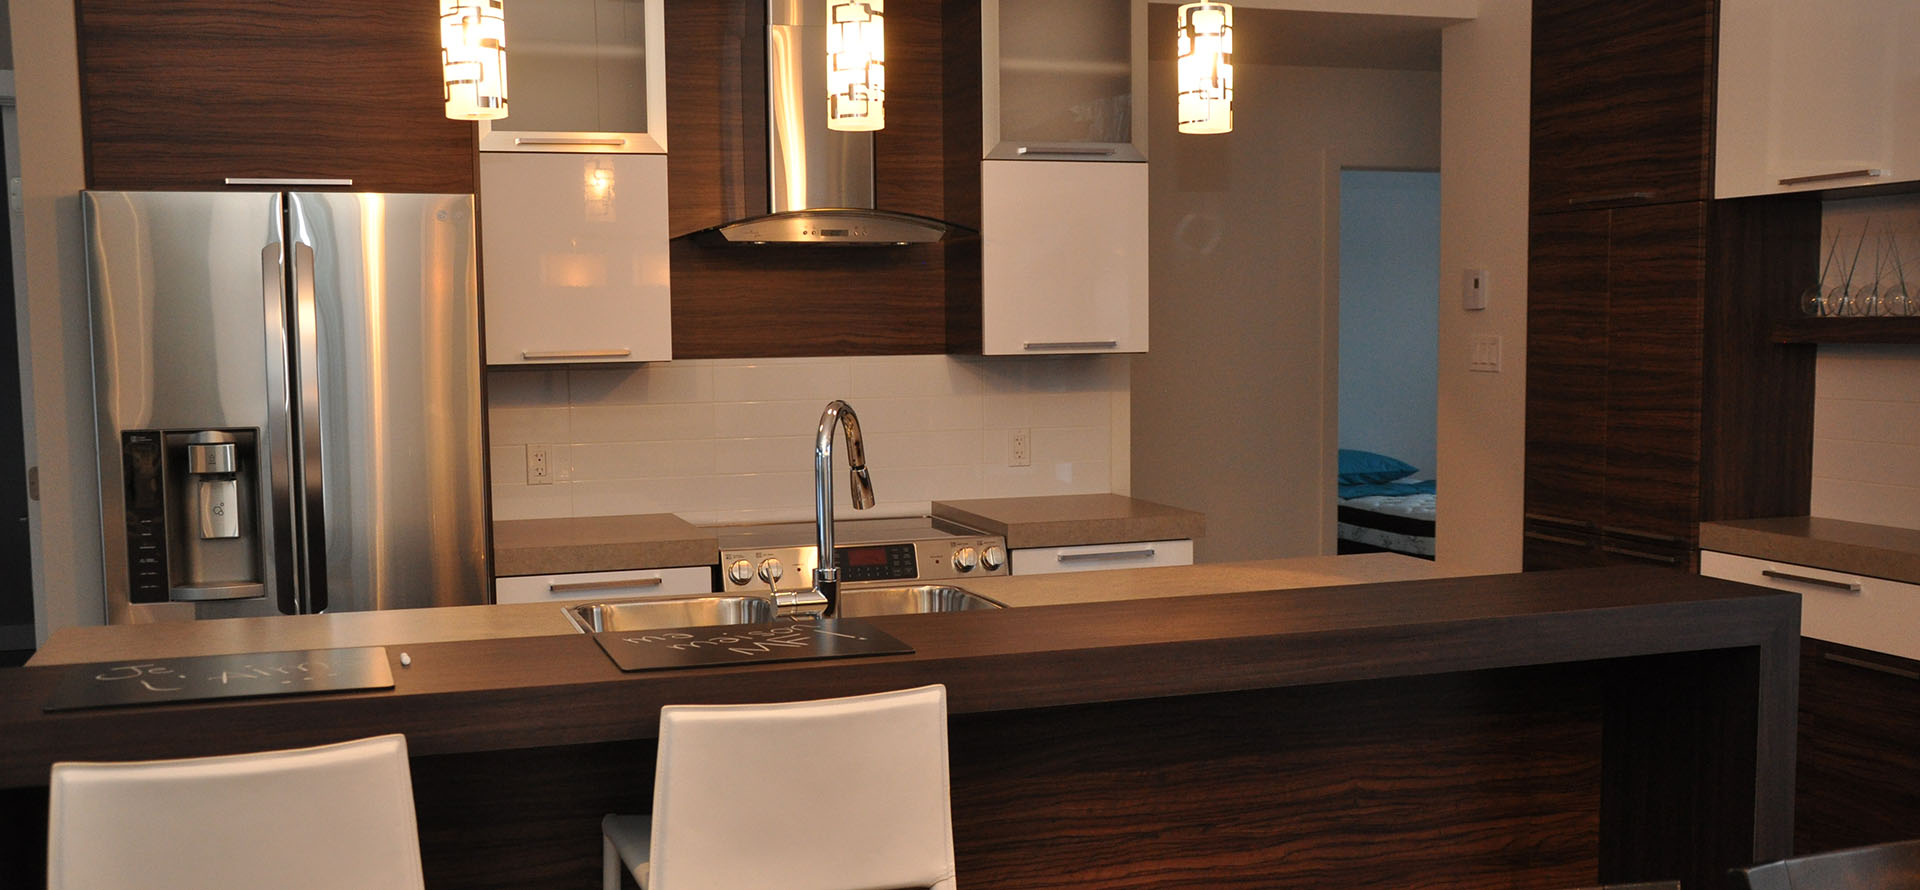 cuisine contemporaine avec armoires de mlamine et comptoirs de stratifi